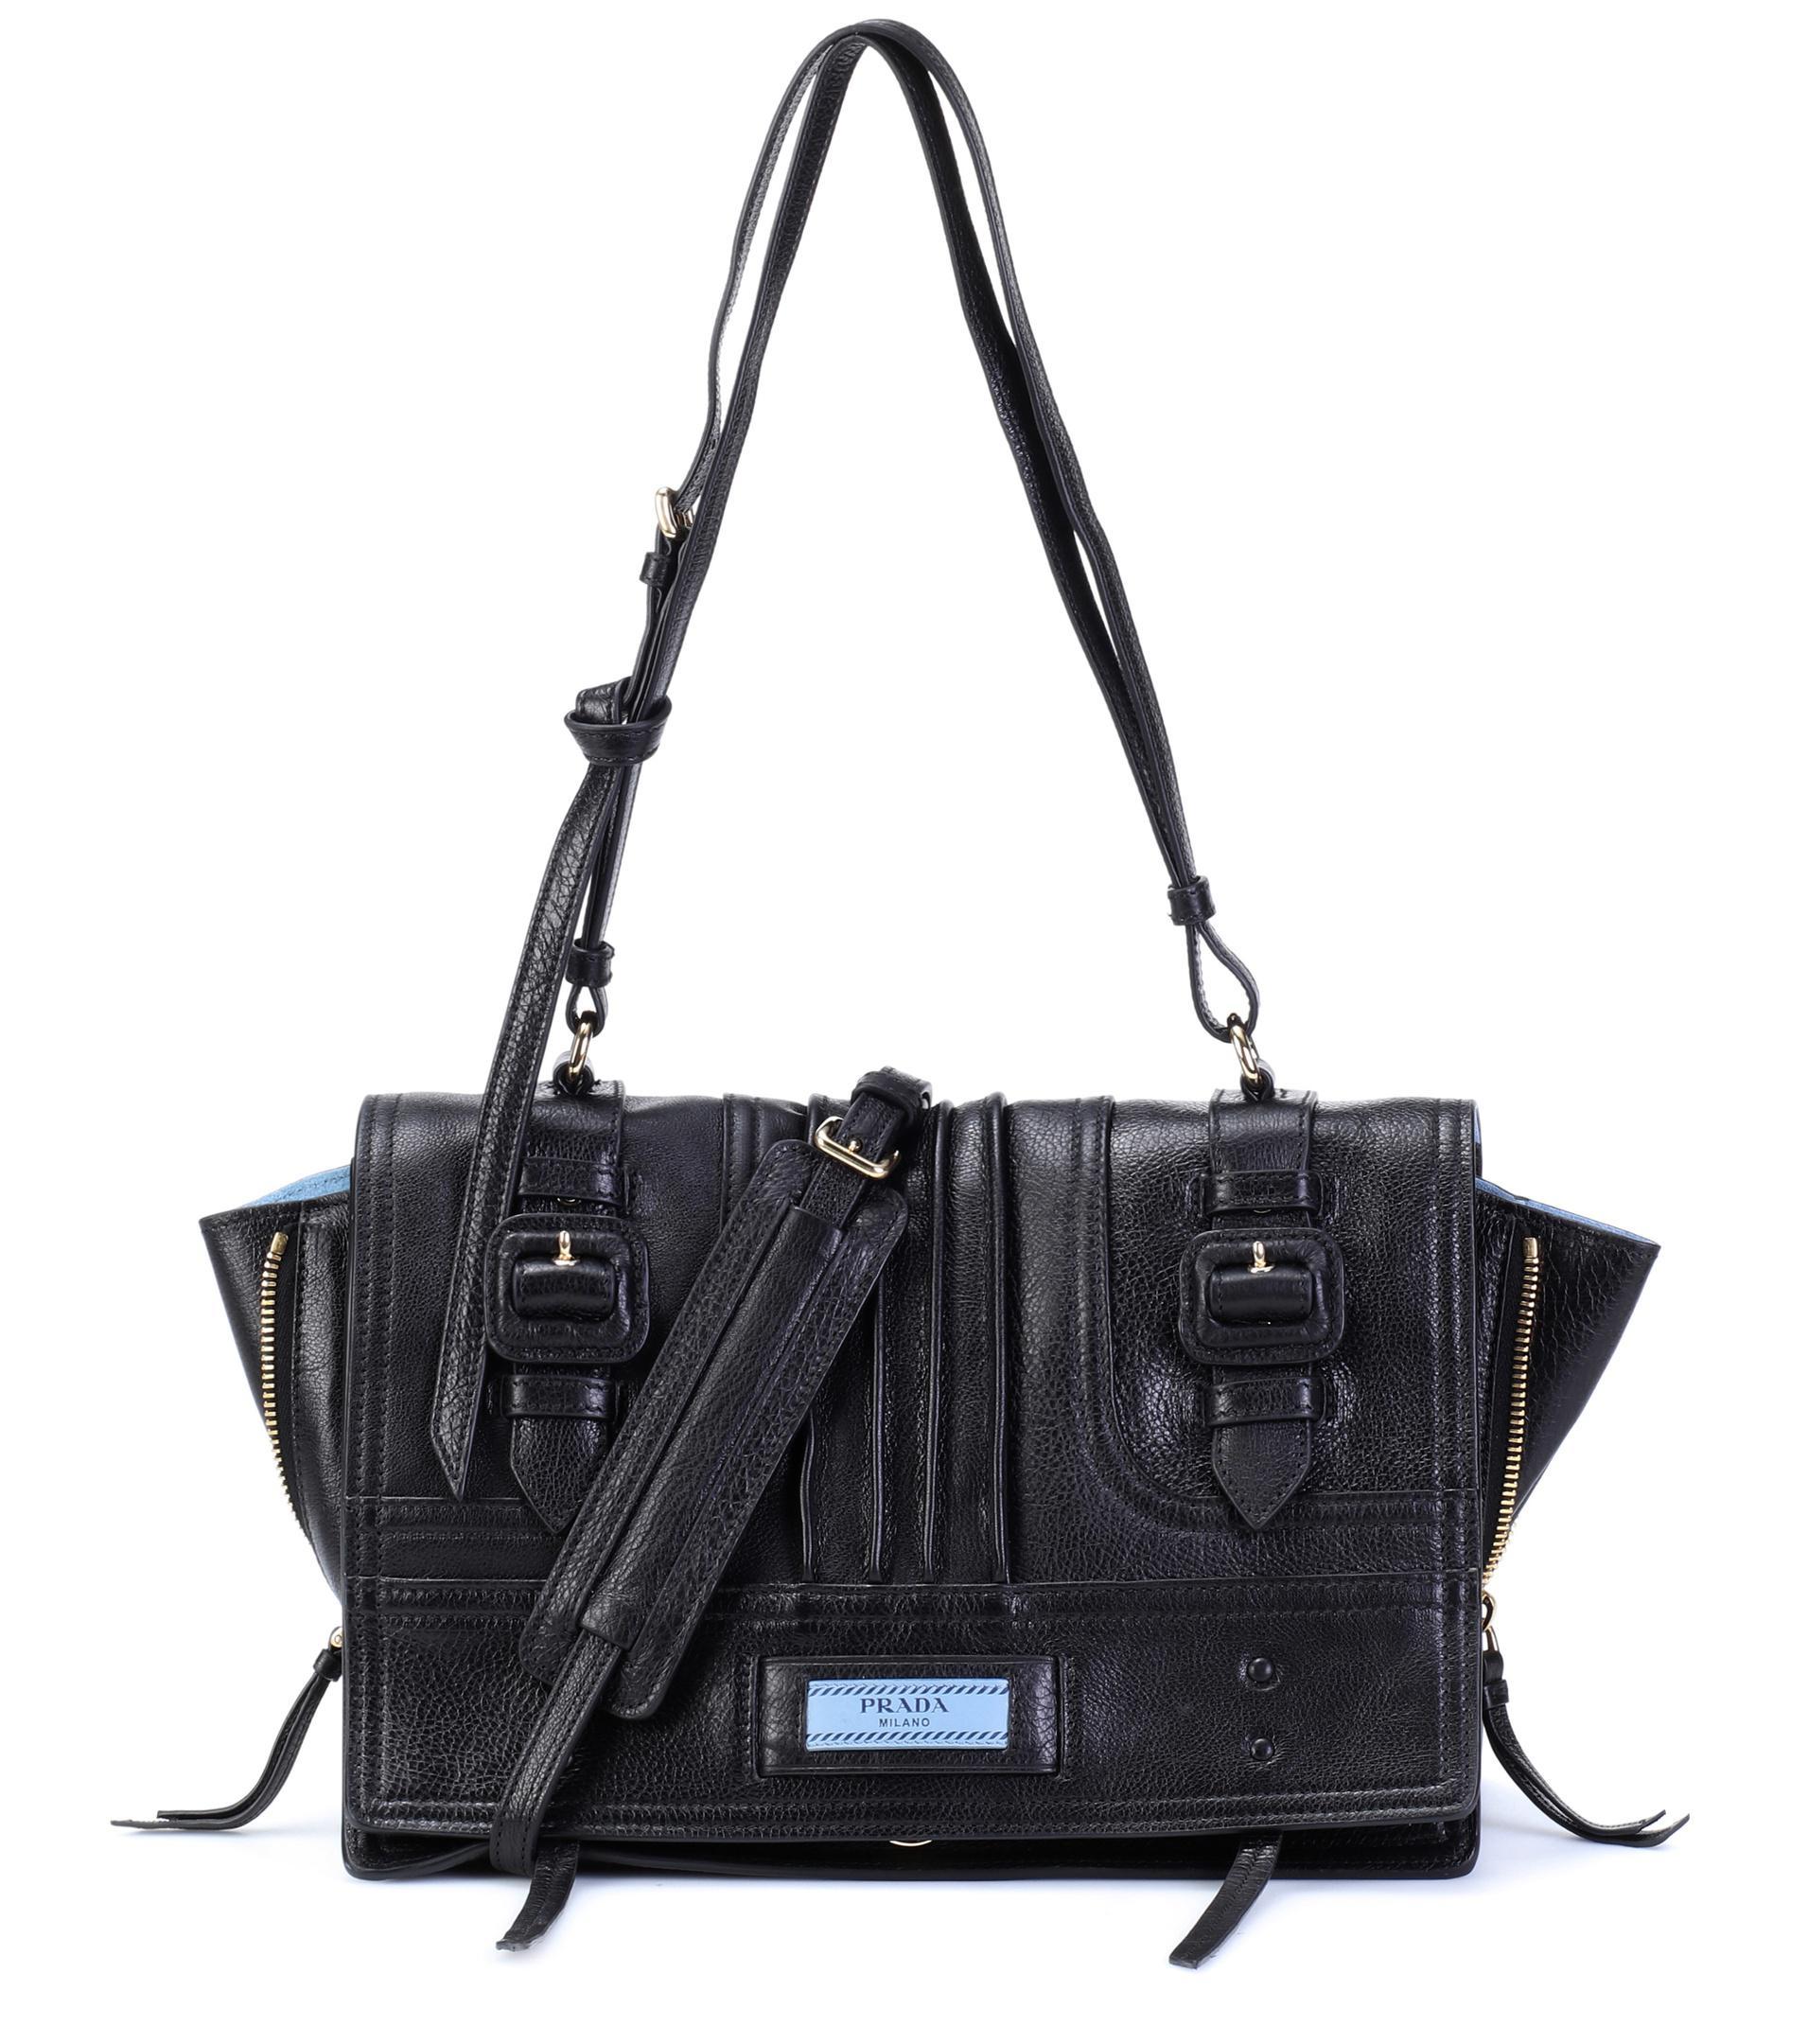 f73aa75b0982 Lyst - Prada Etiquette Leather Shoulder Bag in Black